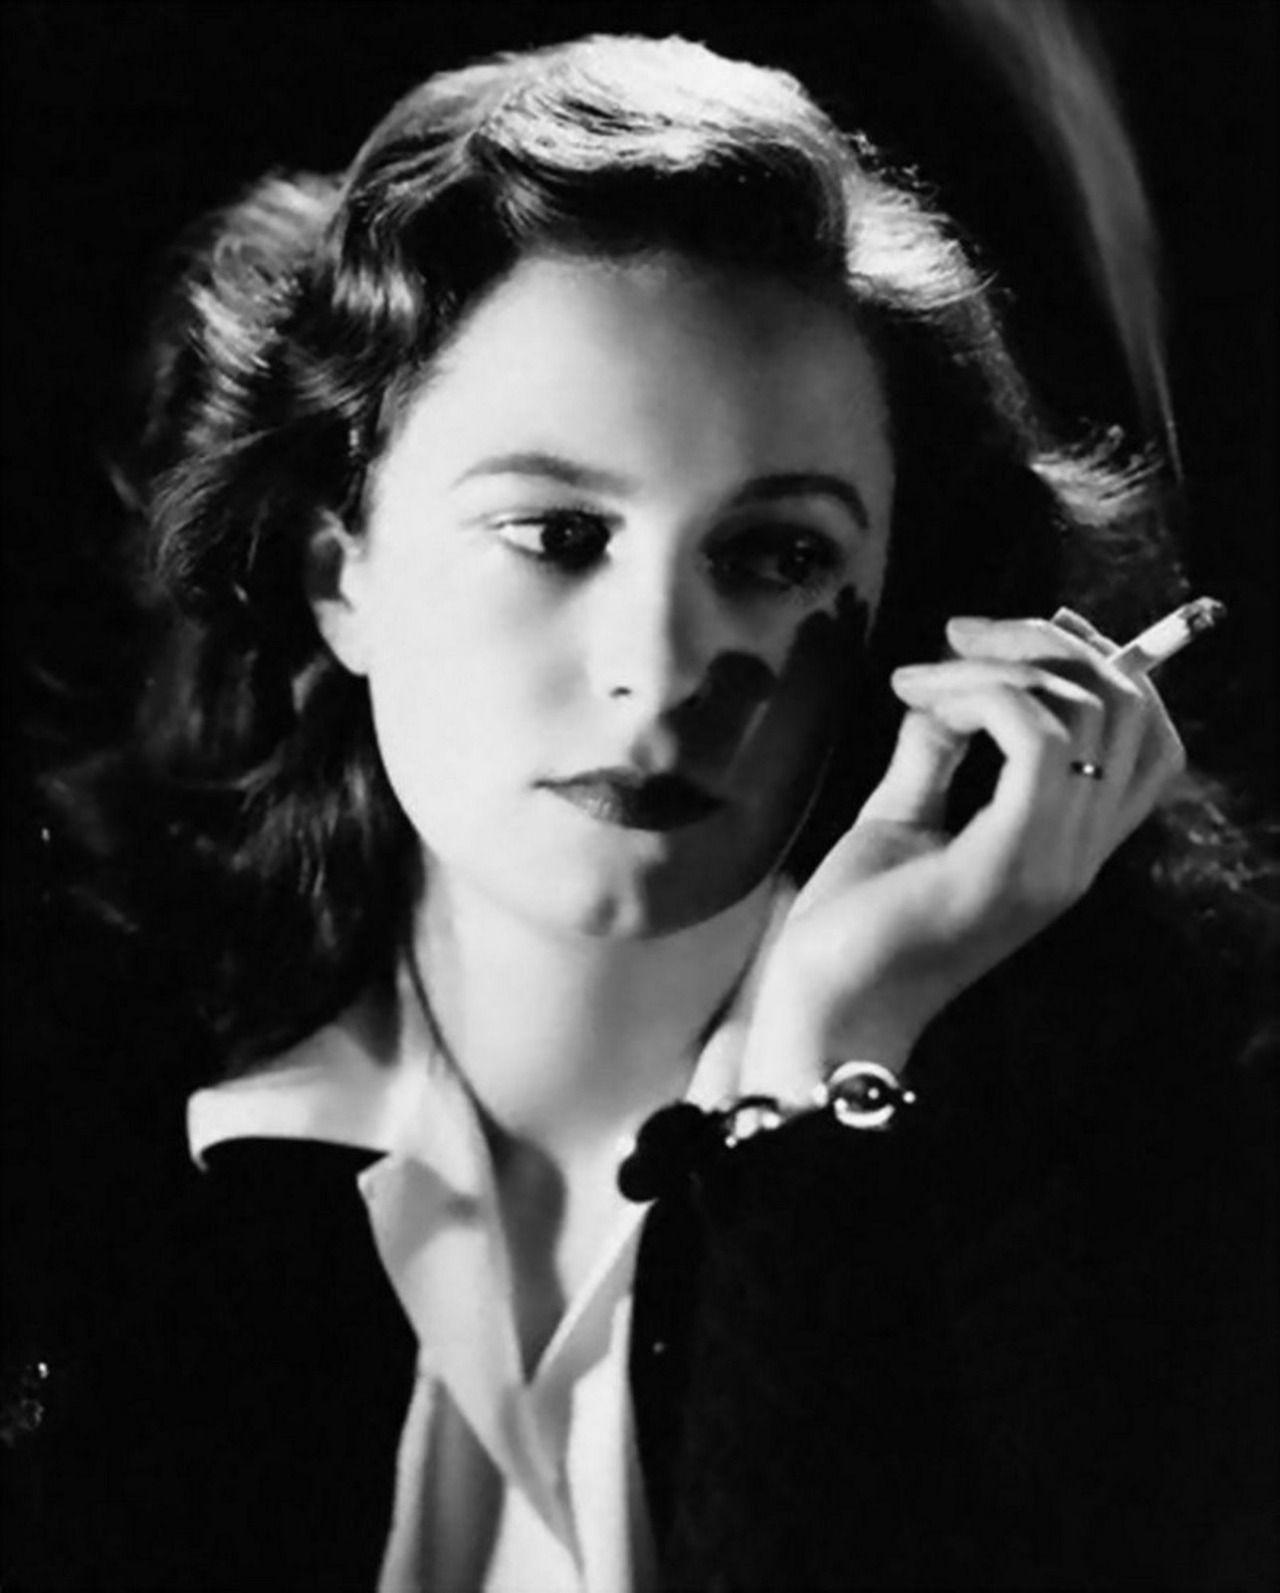 images Geraldine Fitzgerald (British actress)